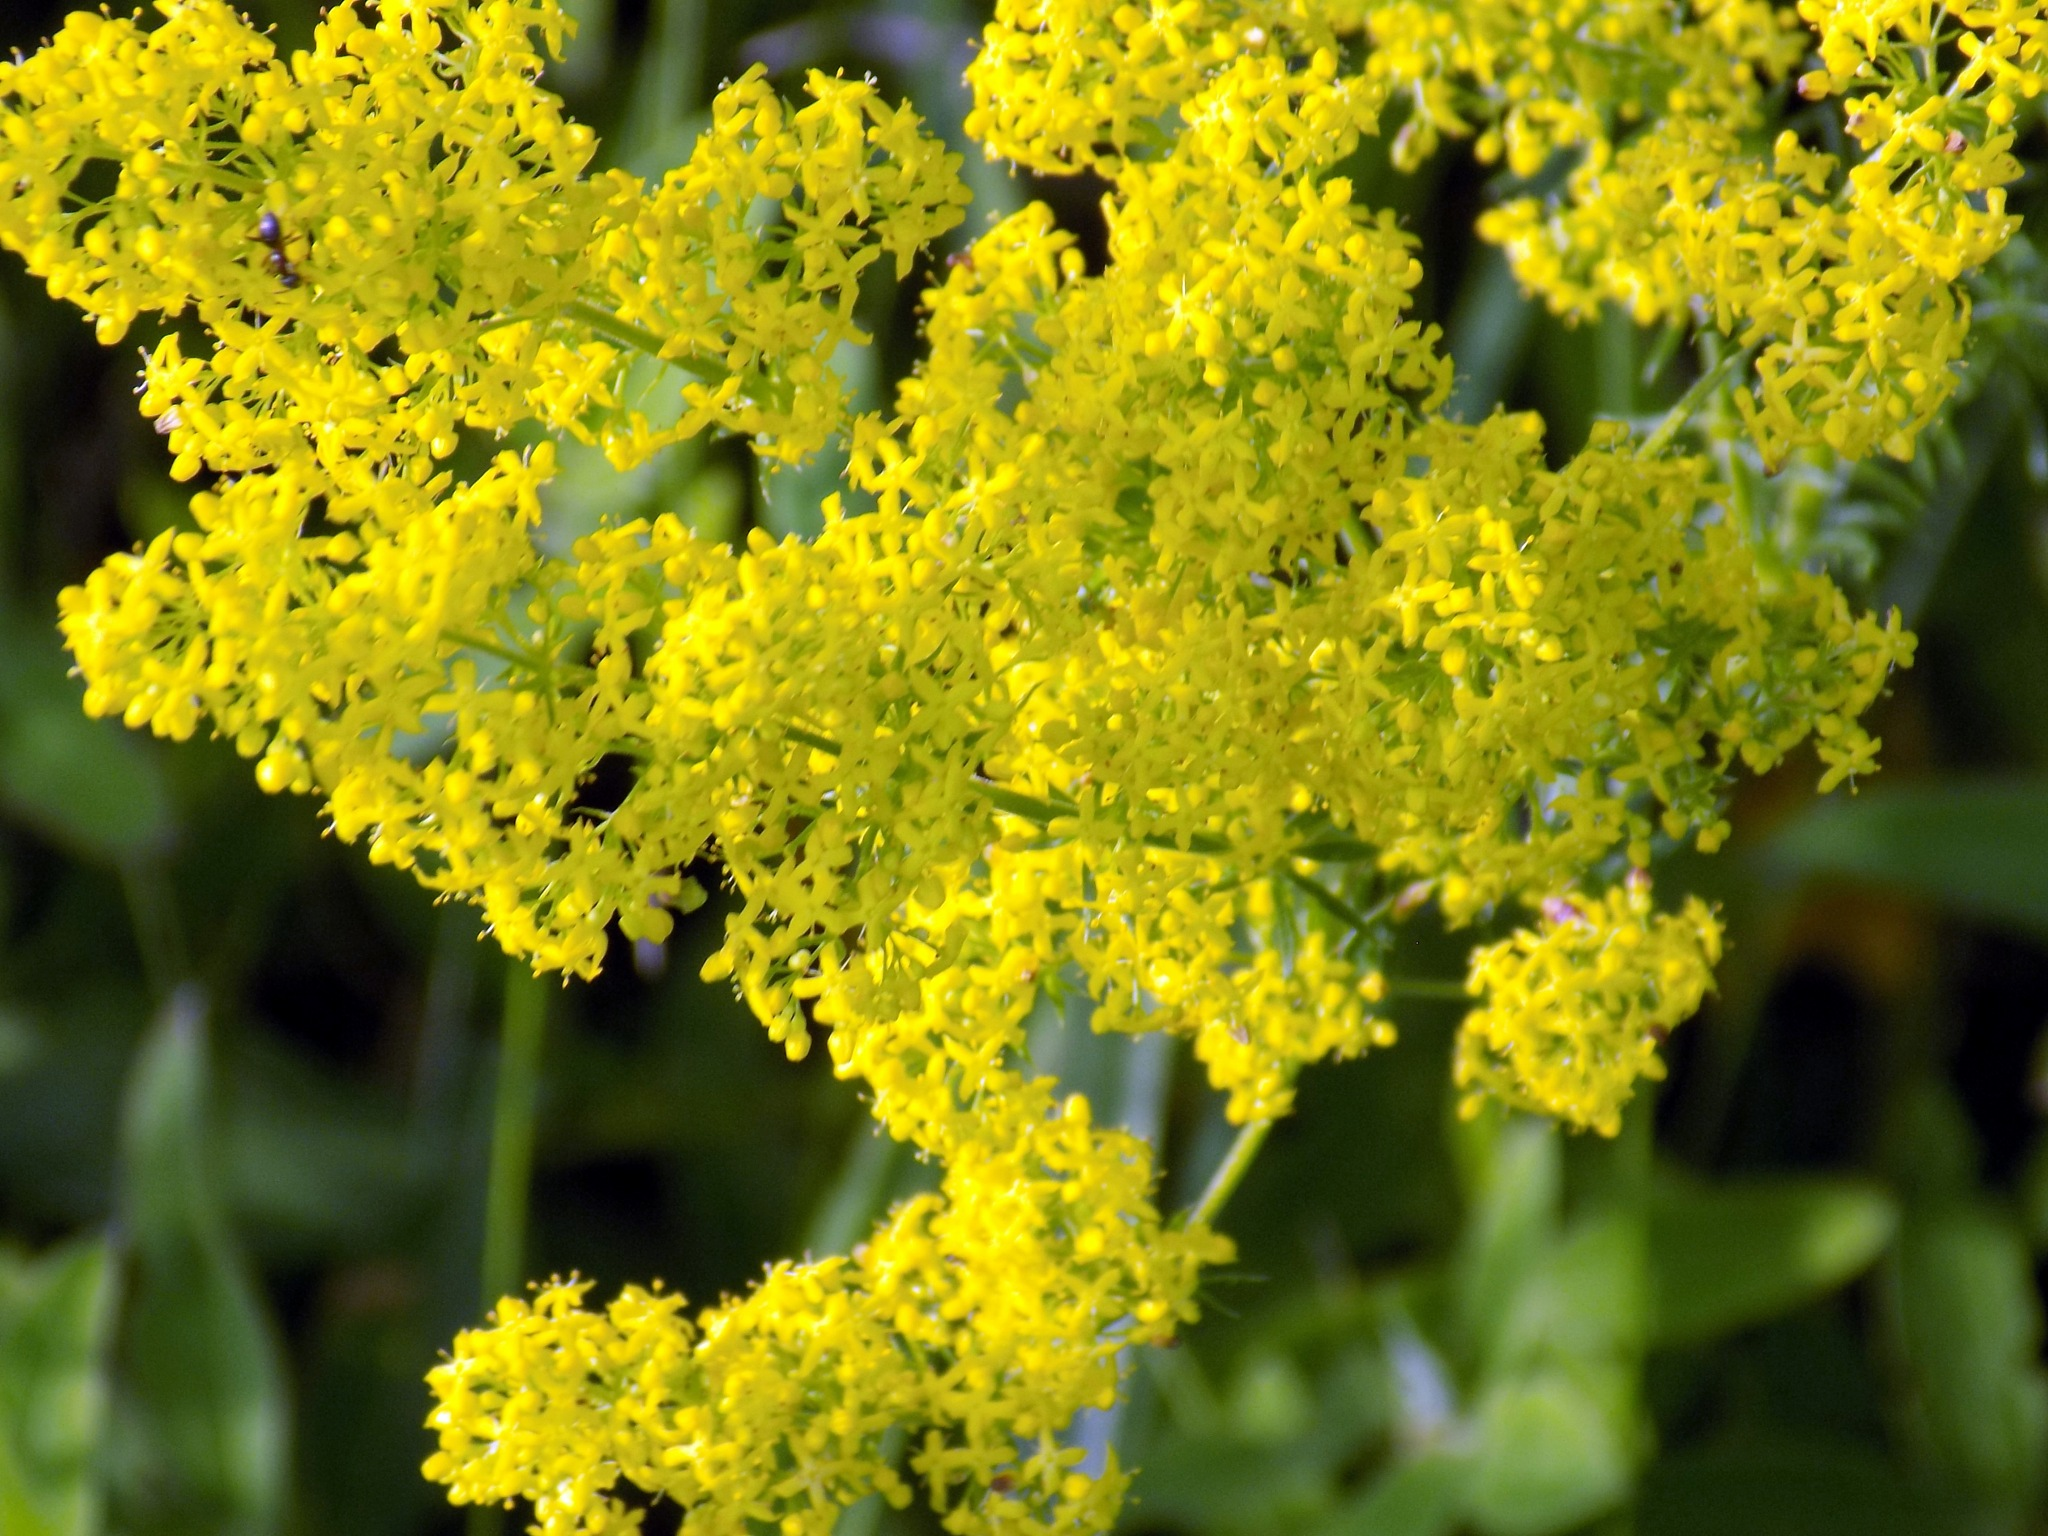 Blooming grass by uzkuraitiene62